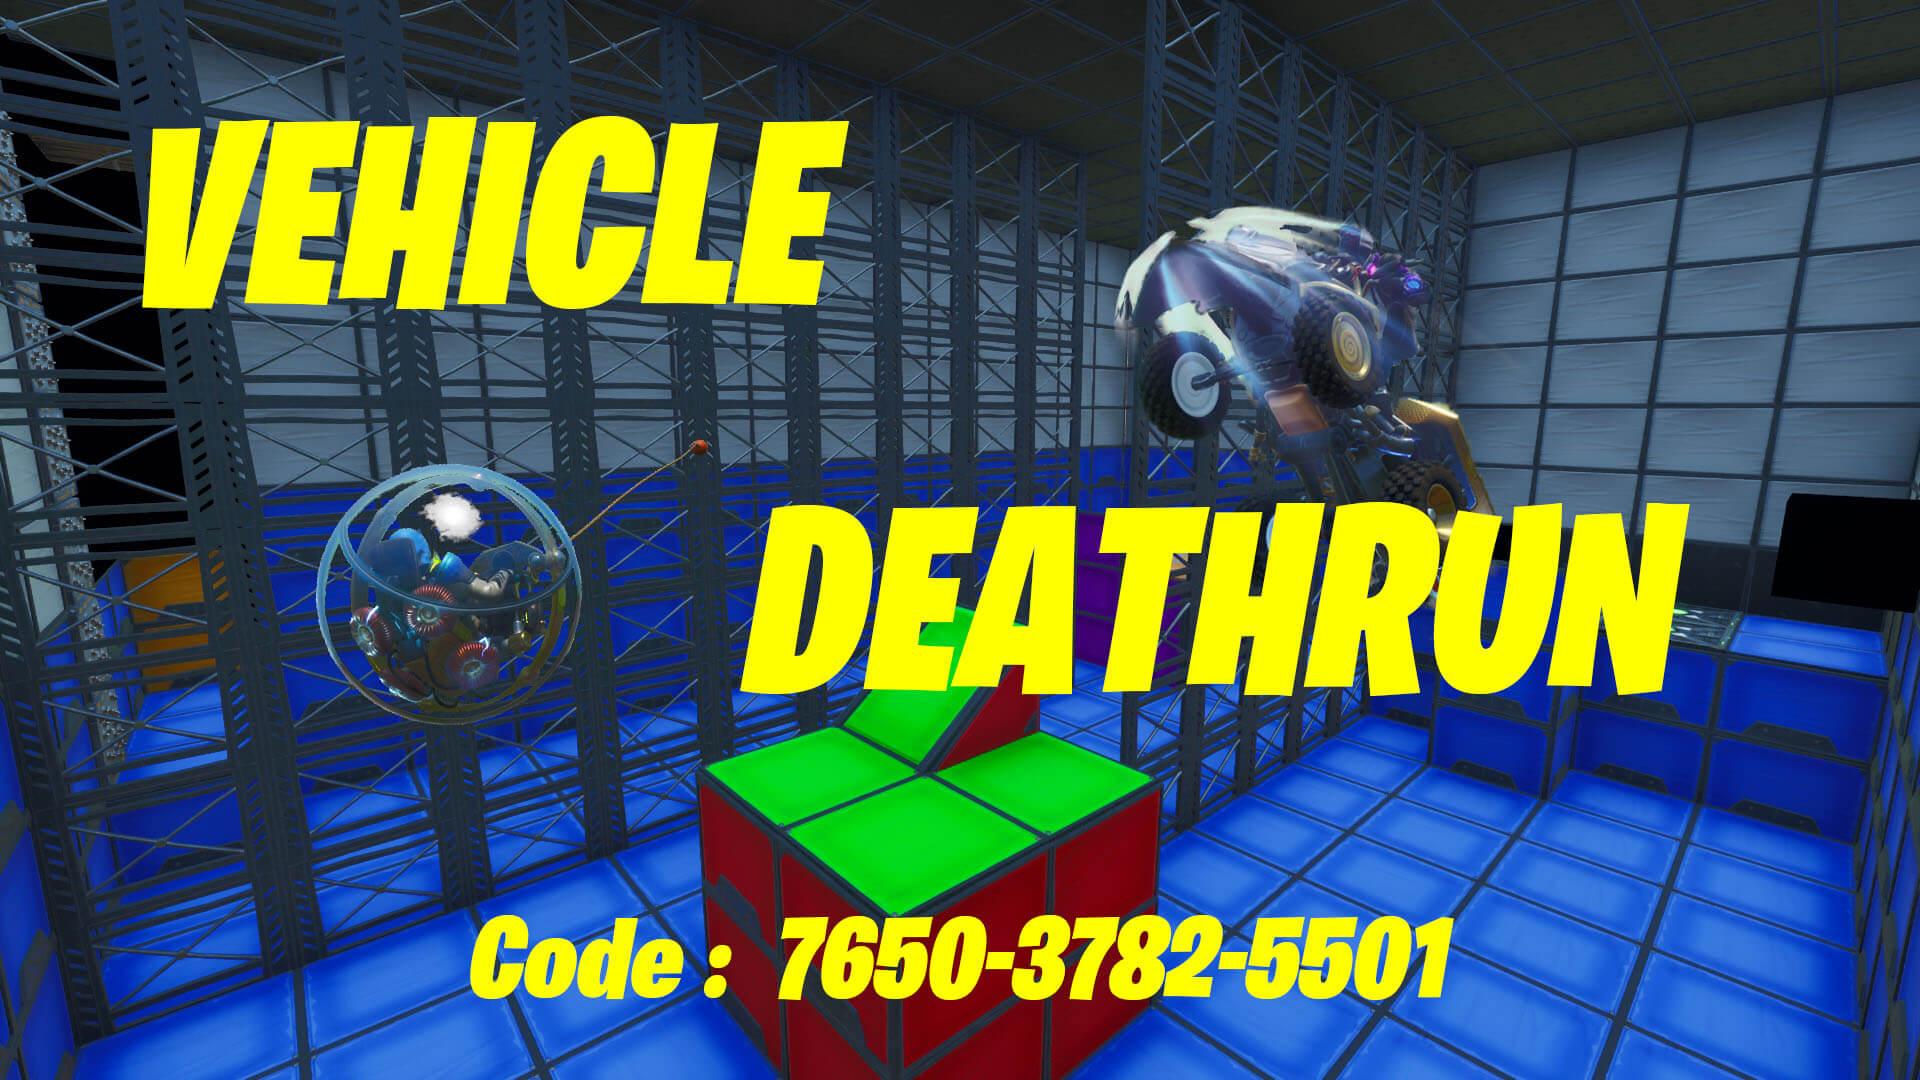 Vehicle Deathrun Fortnite Creative Map Codes Dropnite Com